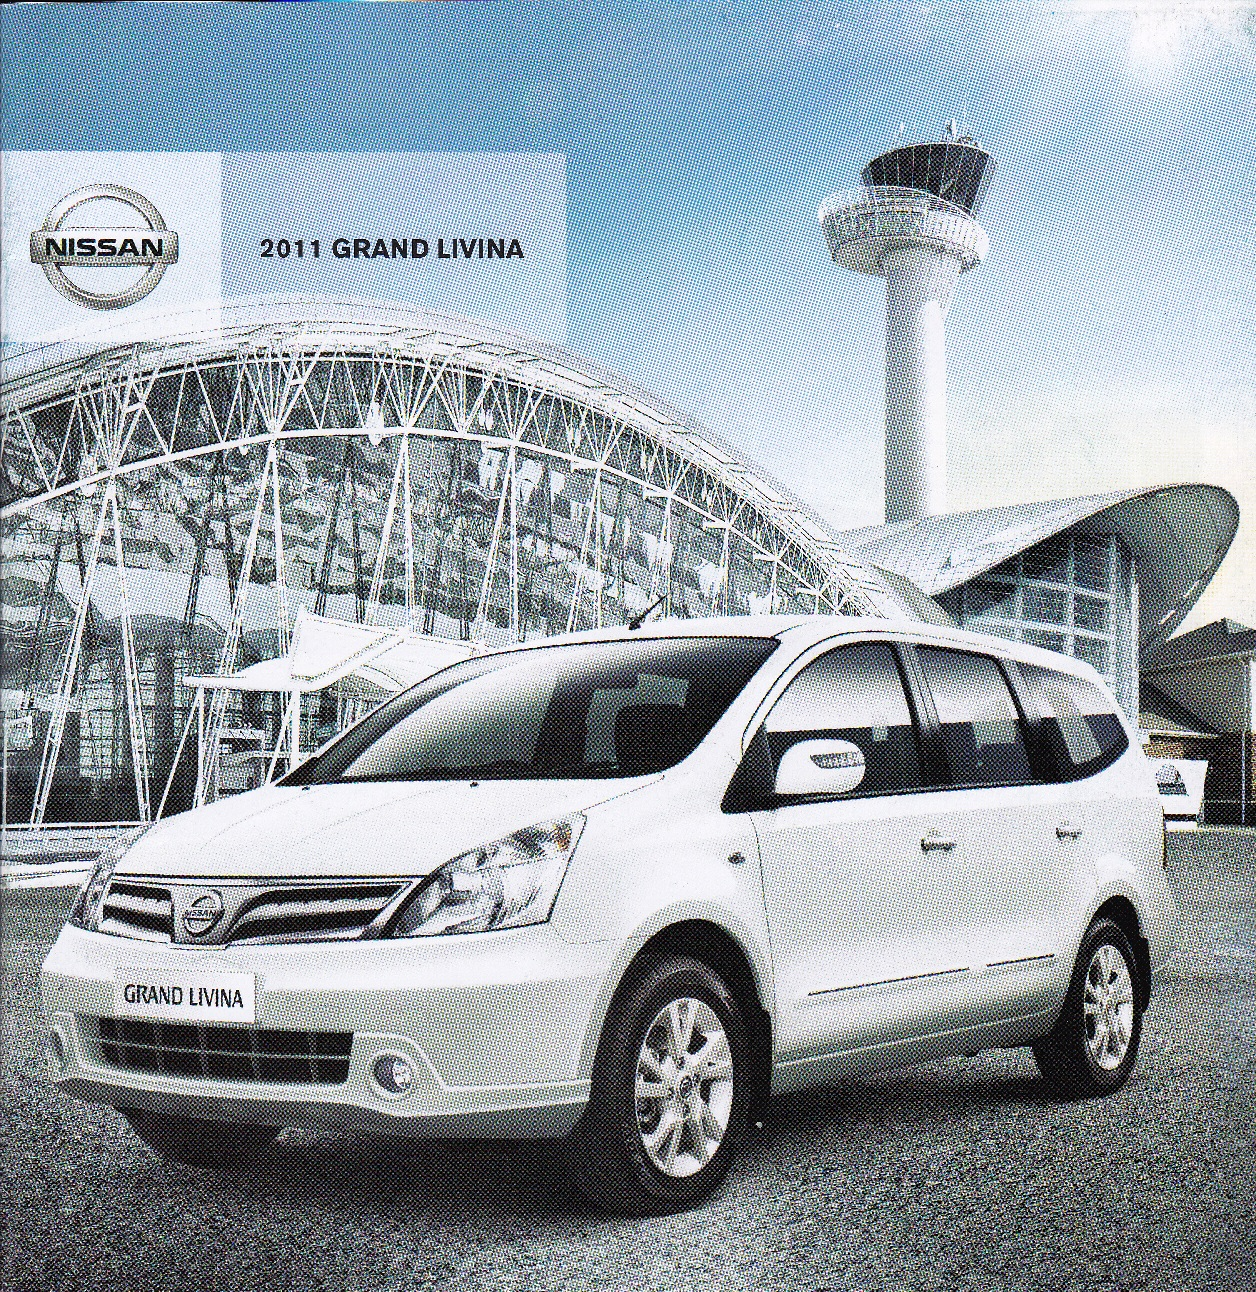 Andy Nissan Malang 081217493783 Brosur Grand Livina Fog Lamp 2012 Complete